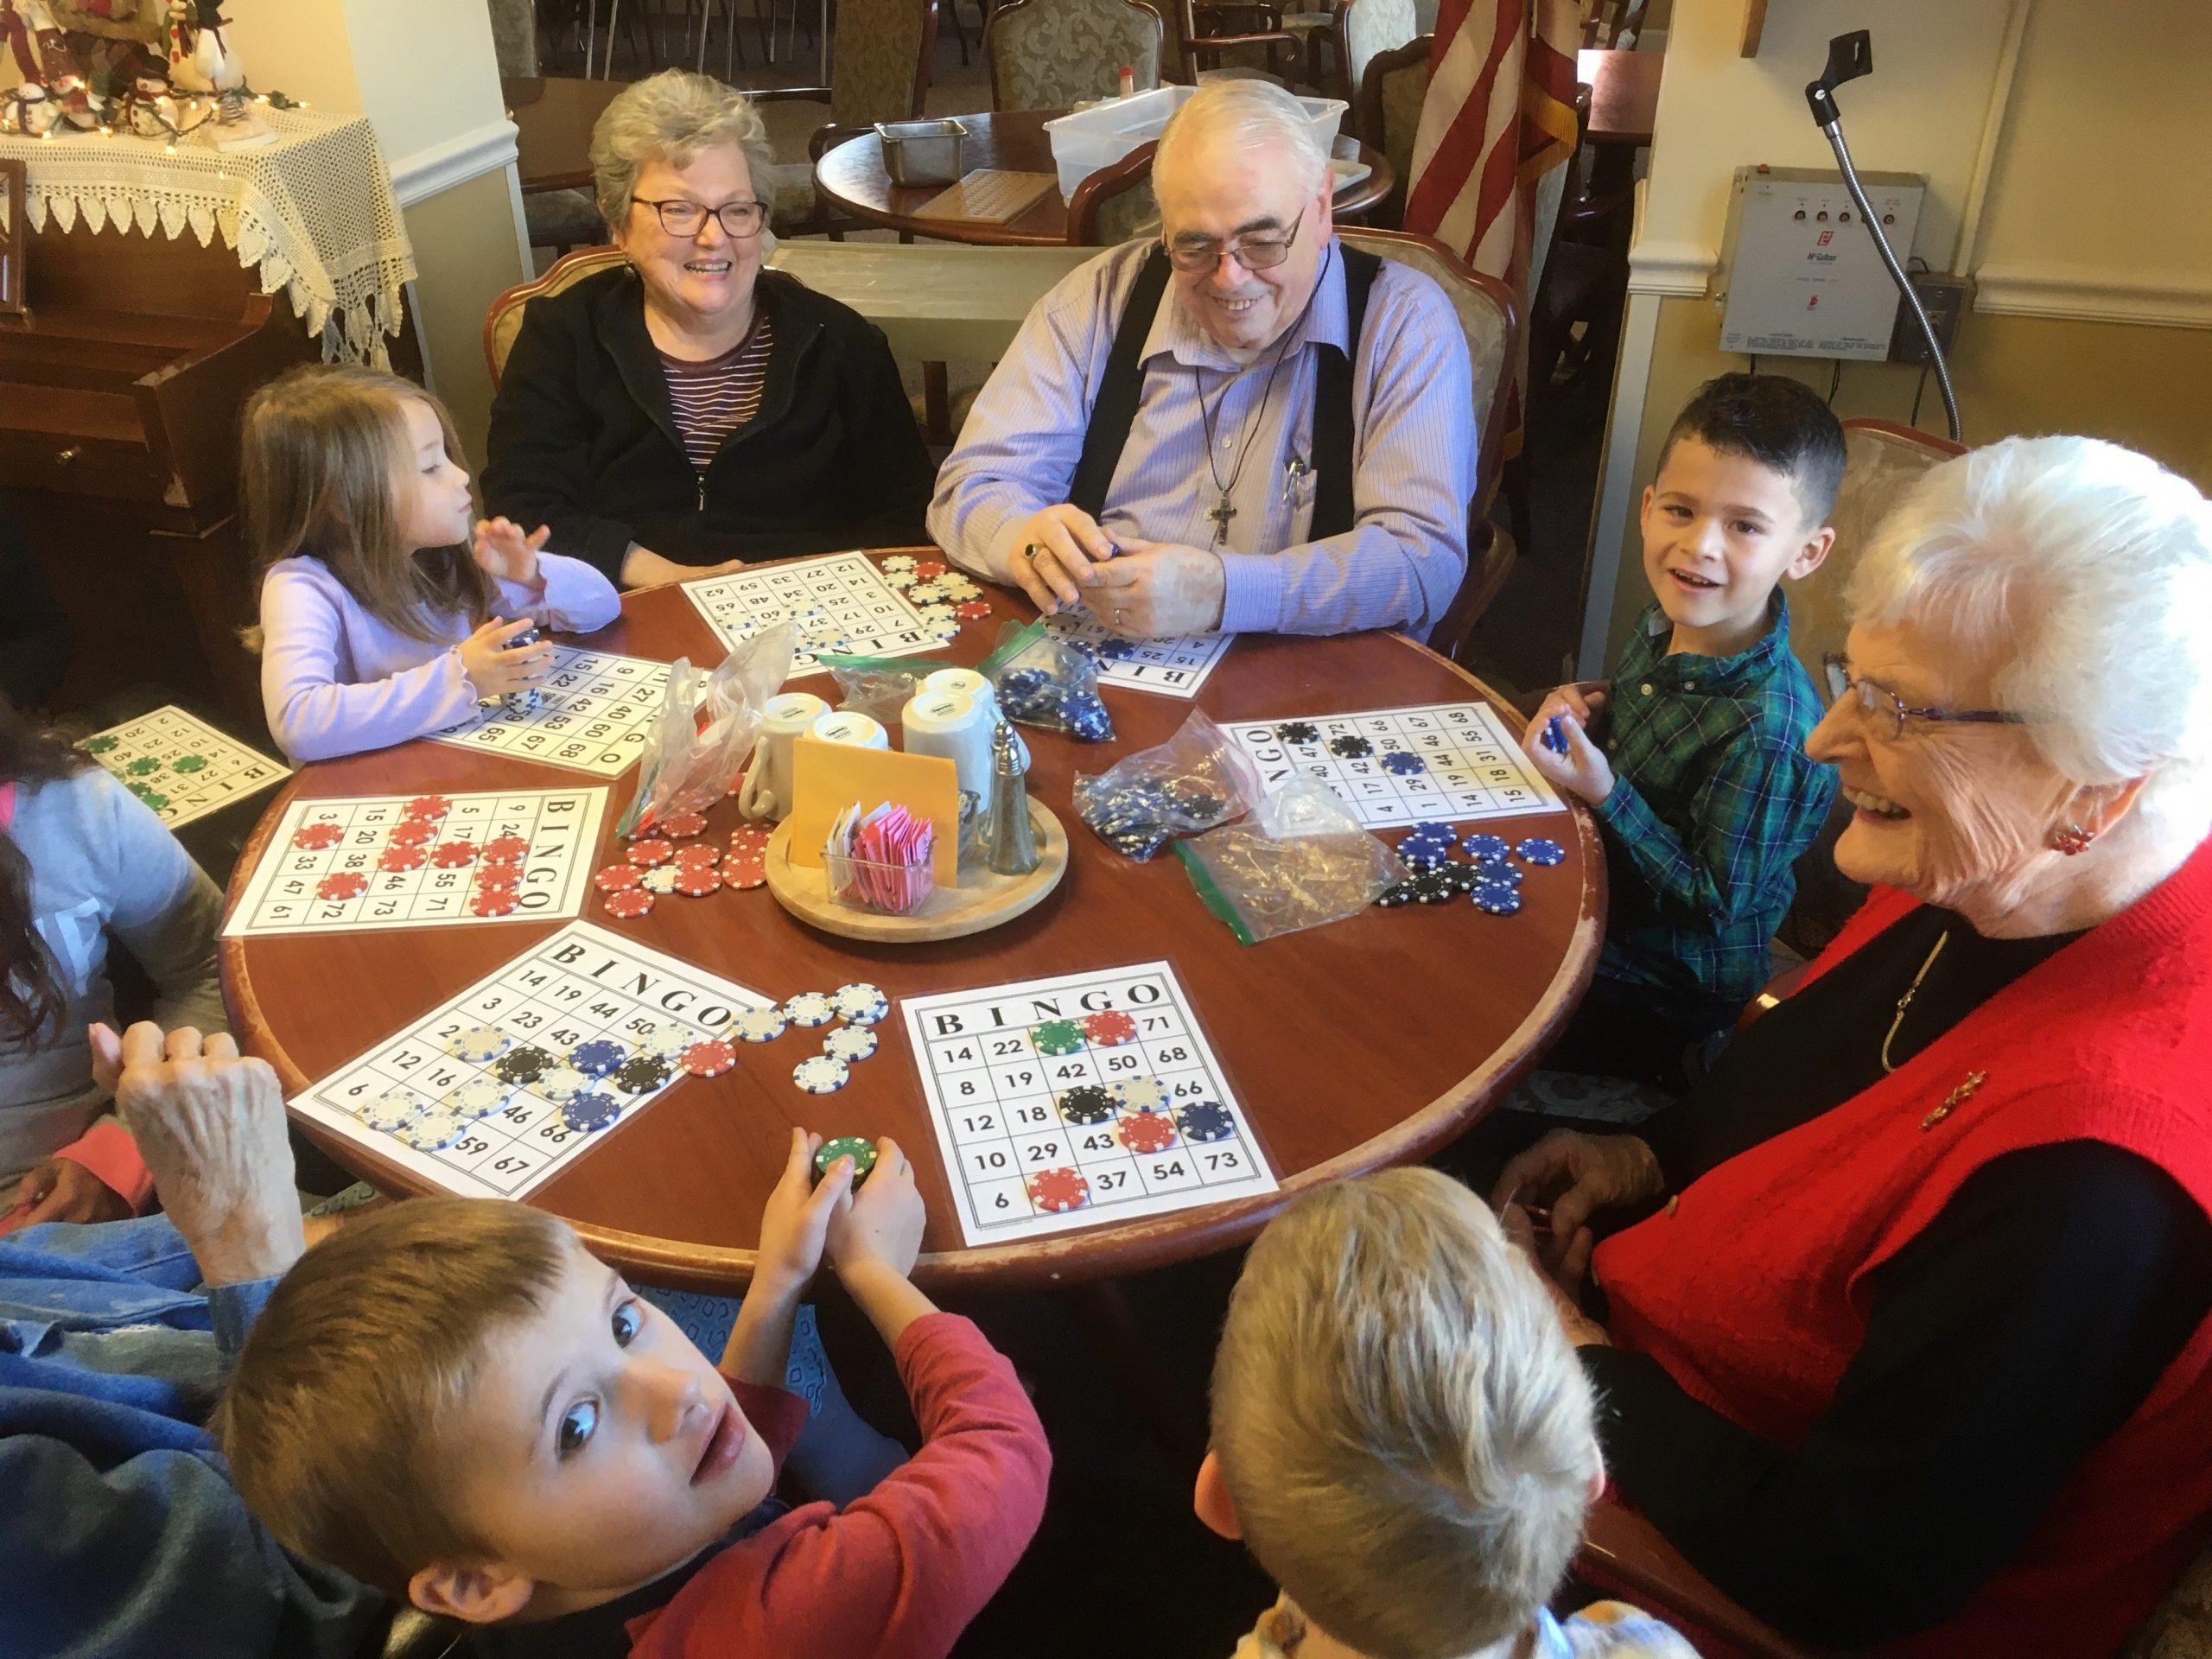 Nursing homes get creative in battling loneliness